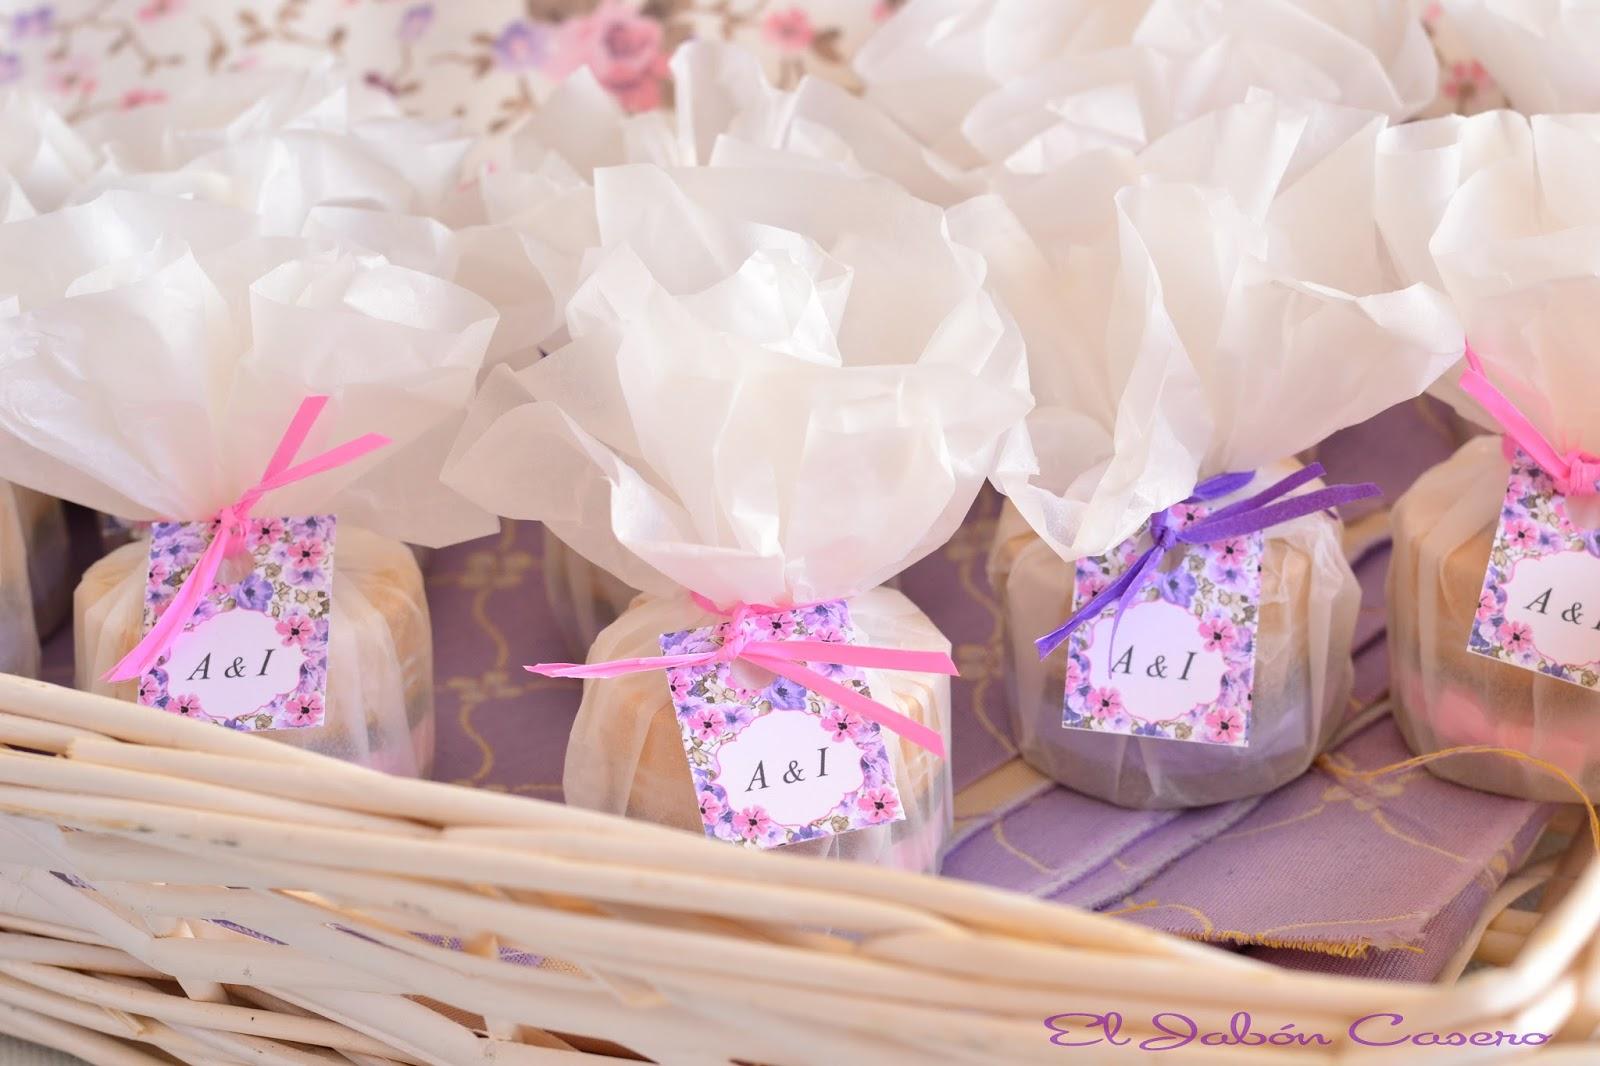 Detalles de boda bálsamos naturales personalizados